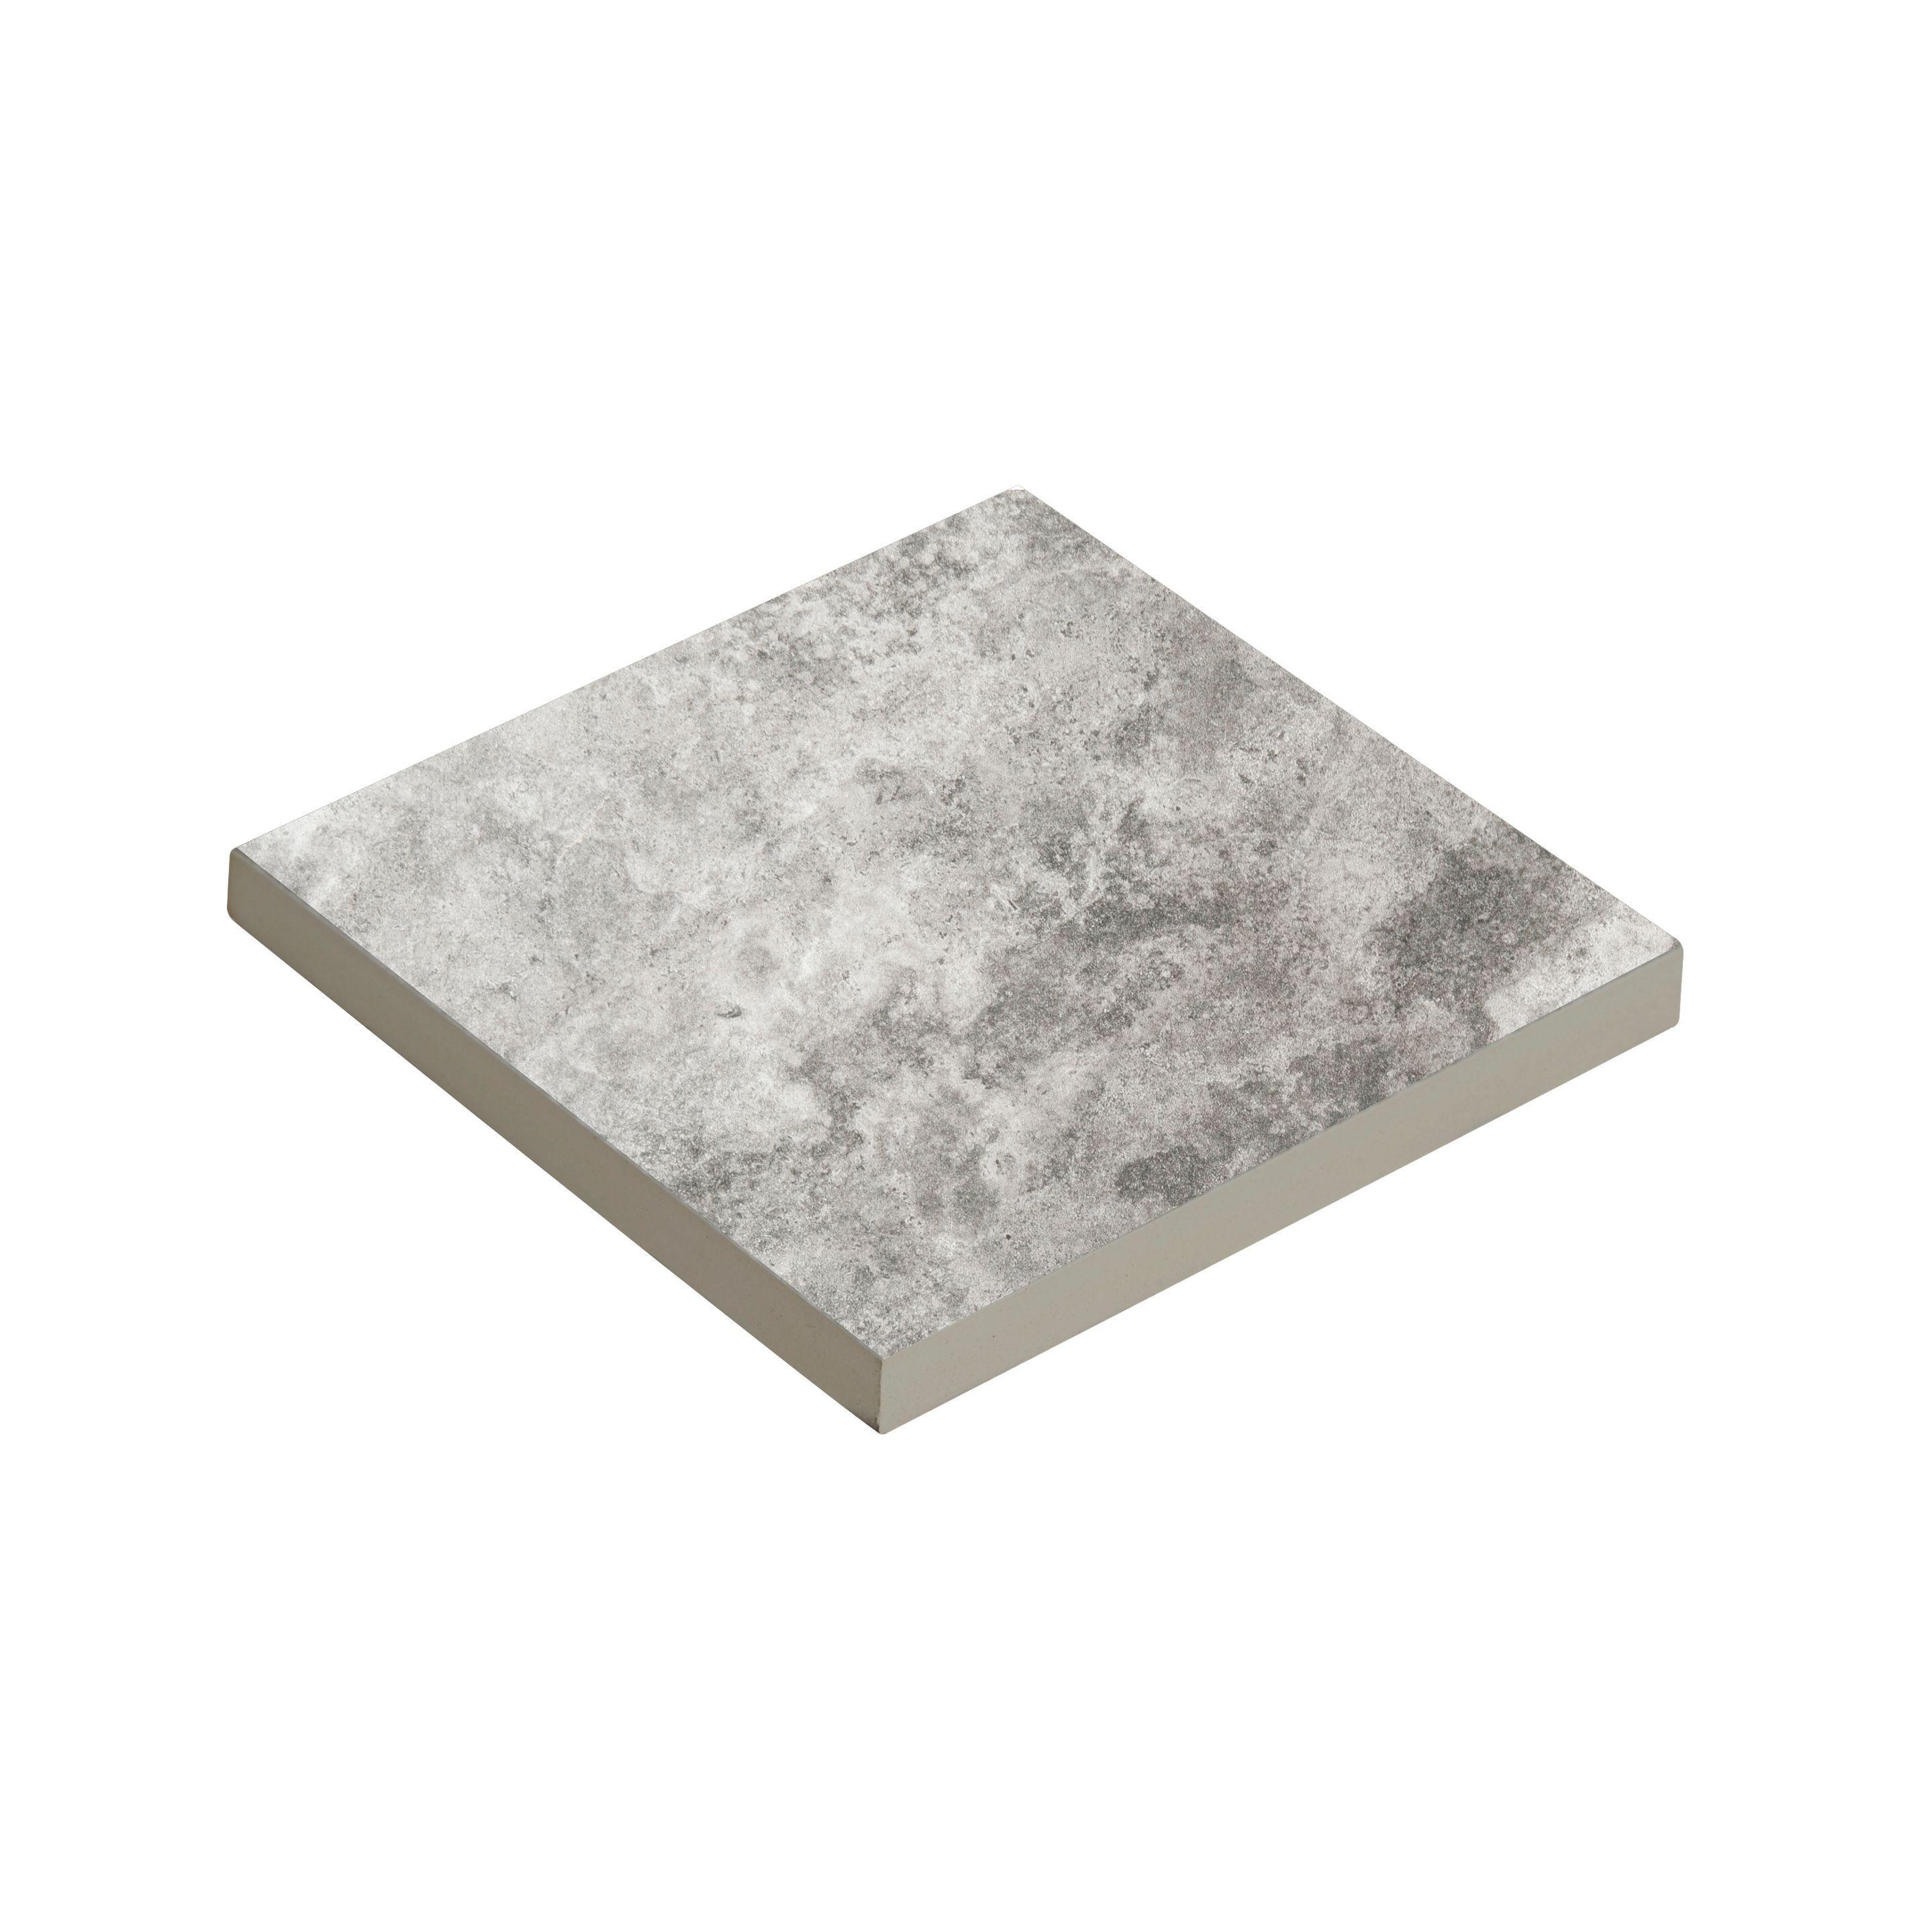 Origin Sand Stone Effect Linear Travertine Ceramic Wall: DIY At B&Q